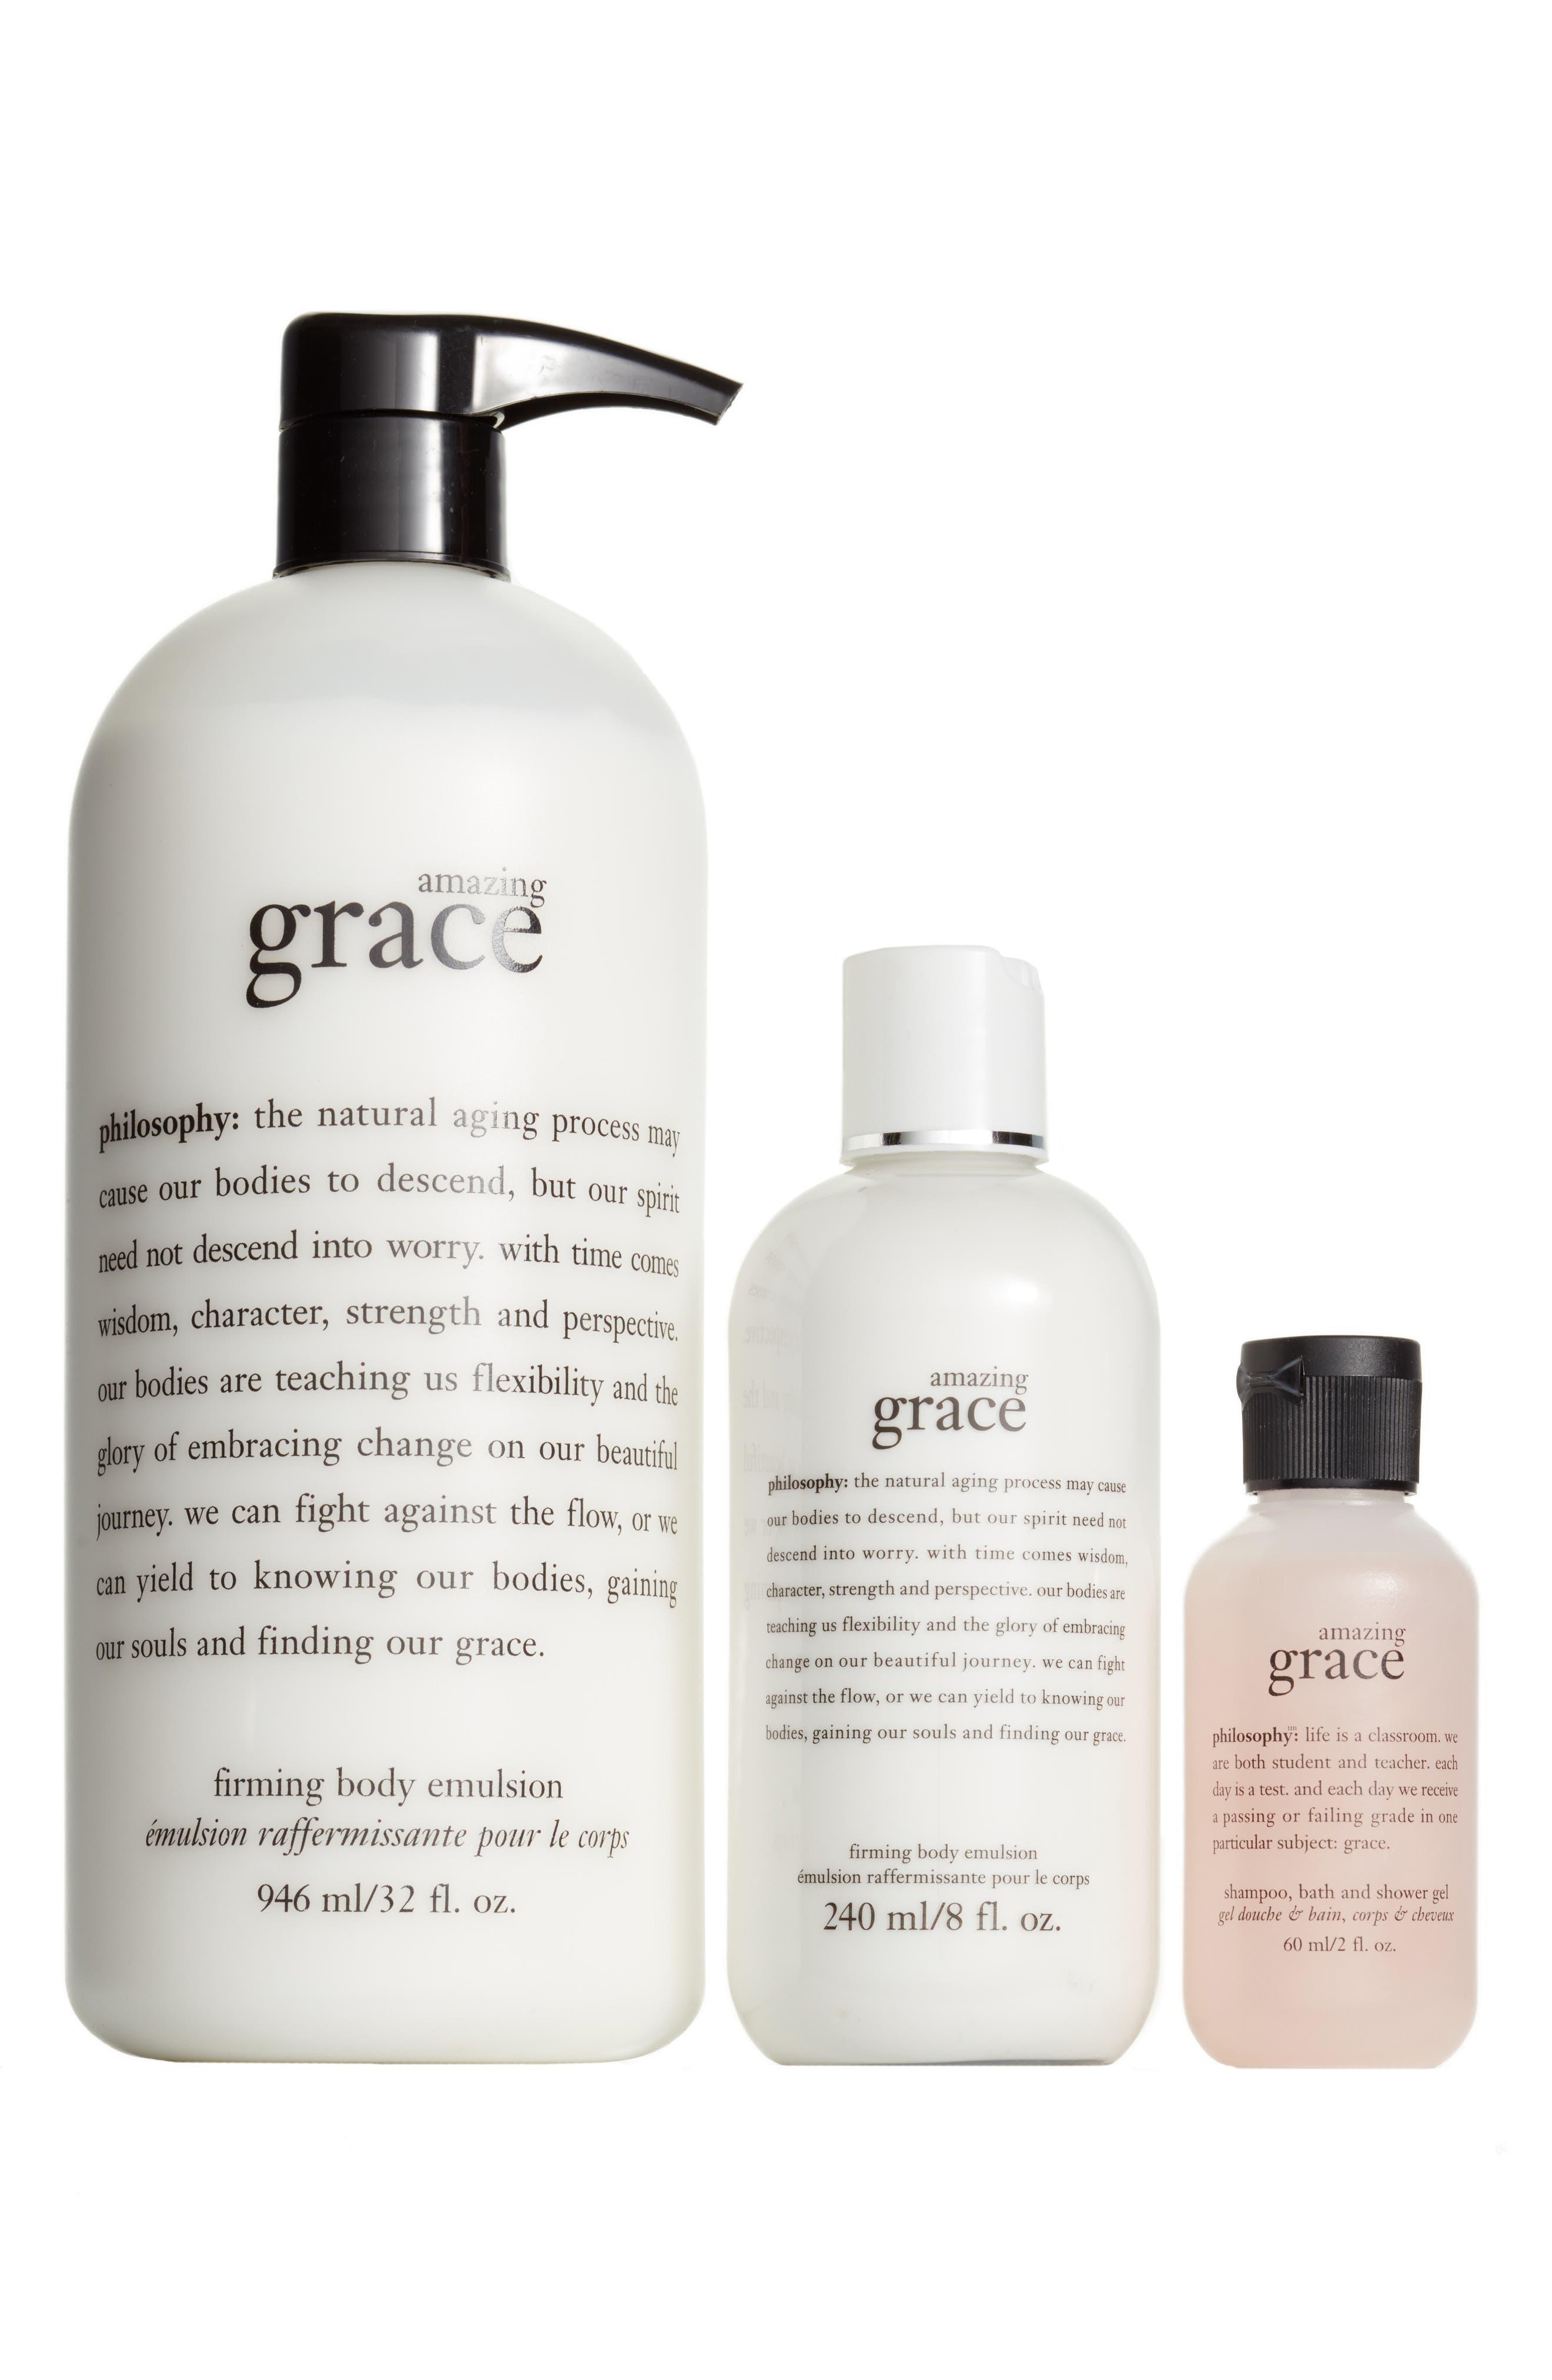 philosophy amazing grace body emulsion & shower gel trio (Nordstrom Exclusive) ($83 Value)